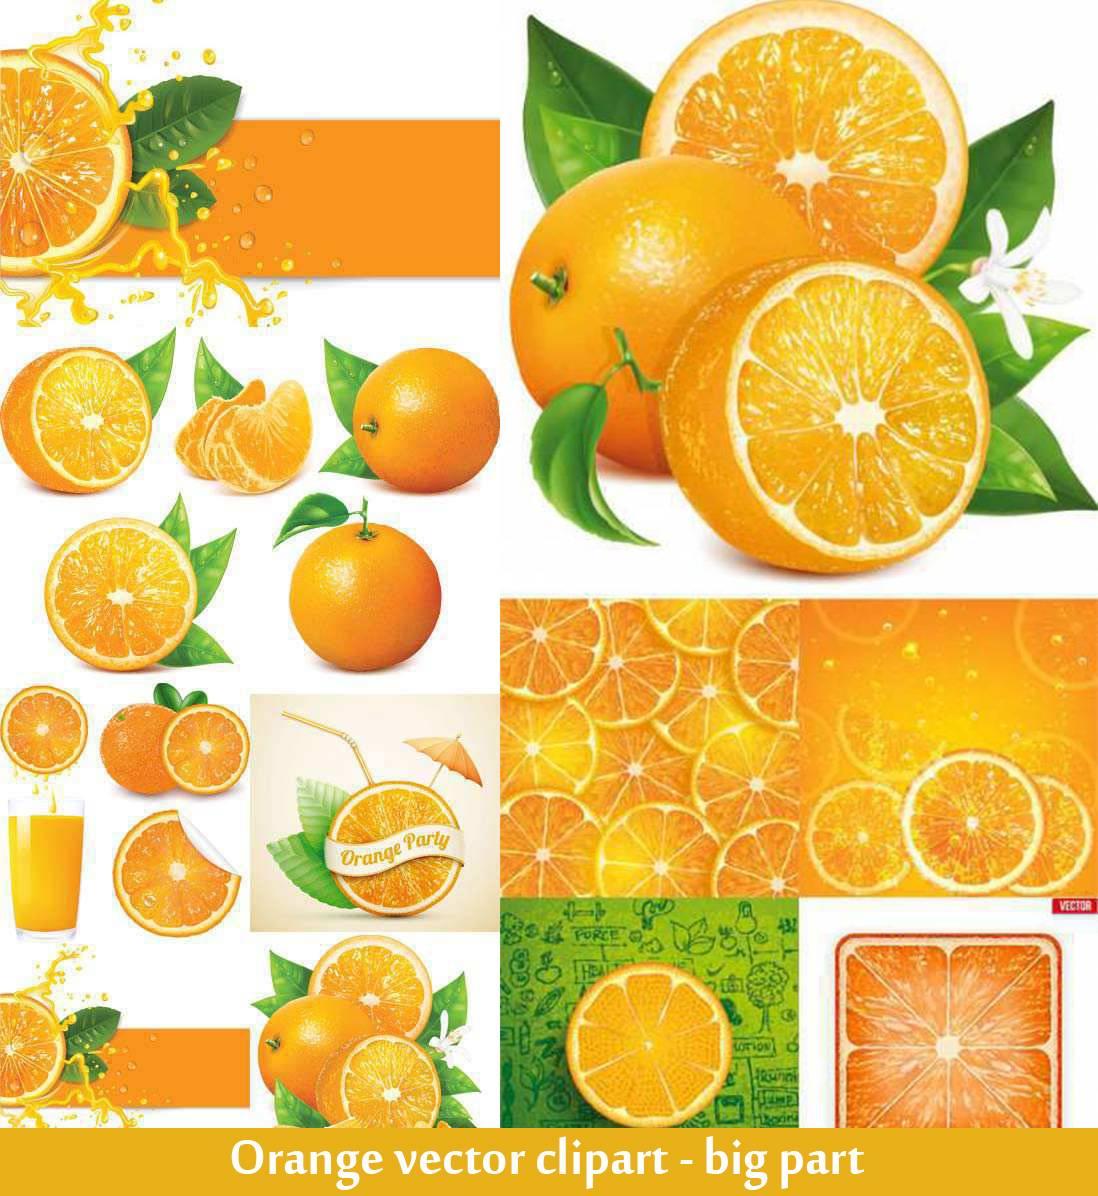 Orange-Clipart-big-part-on-white-background